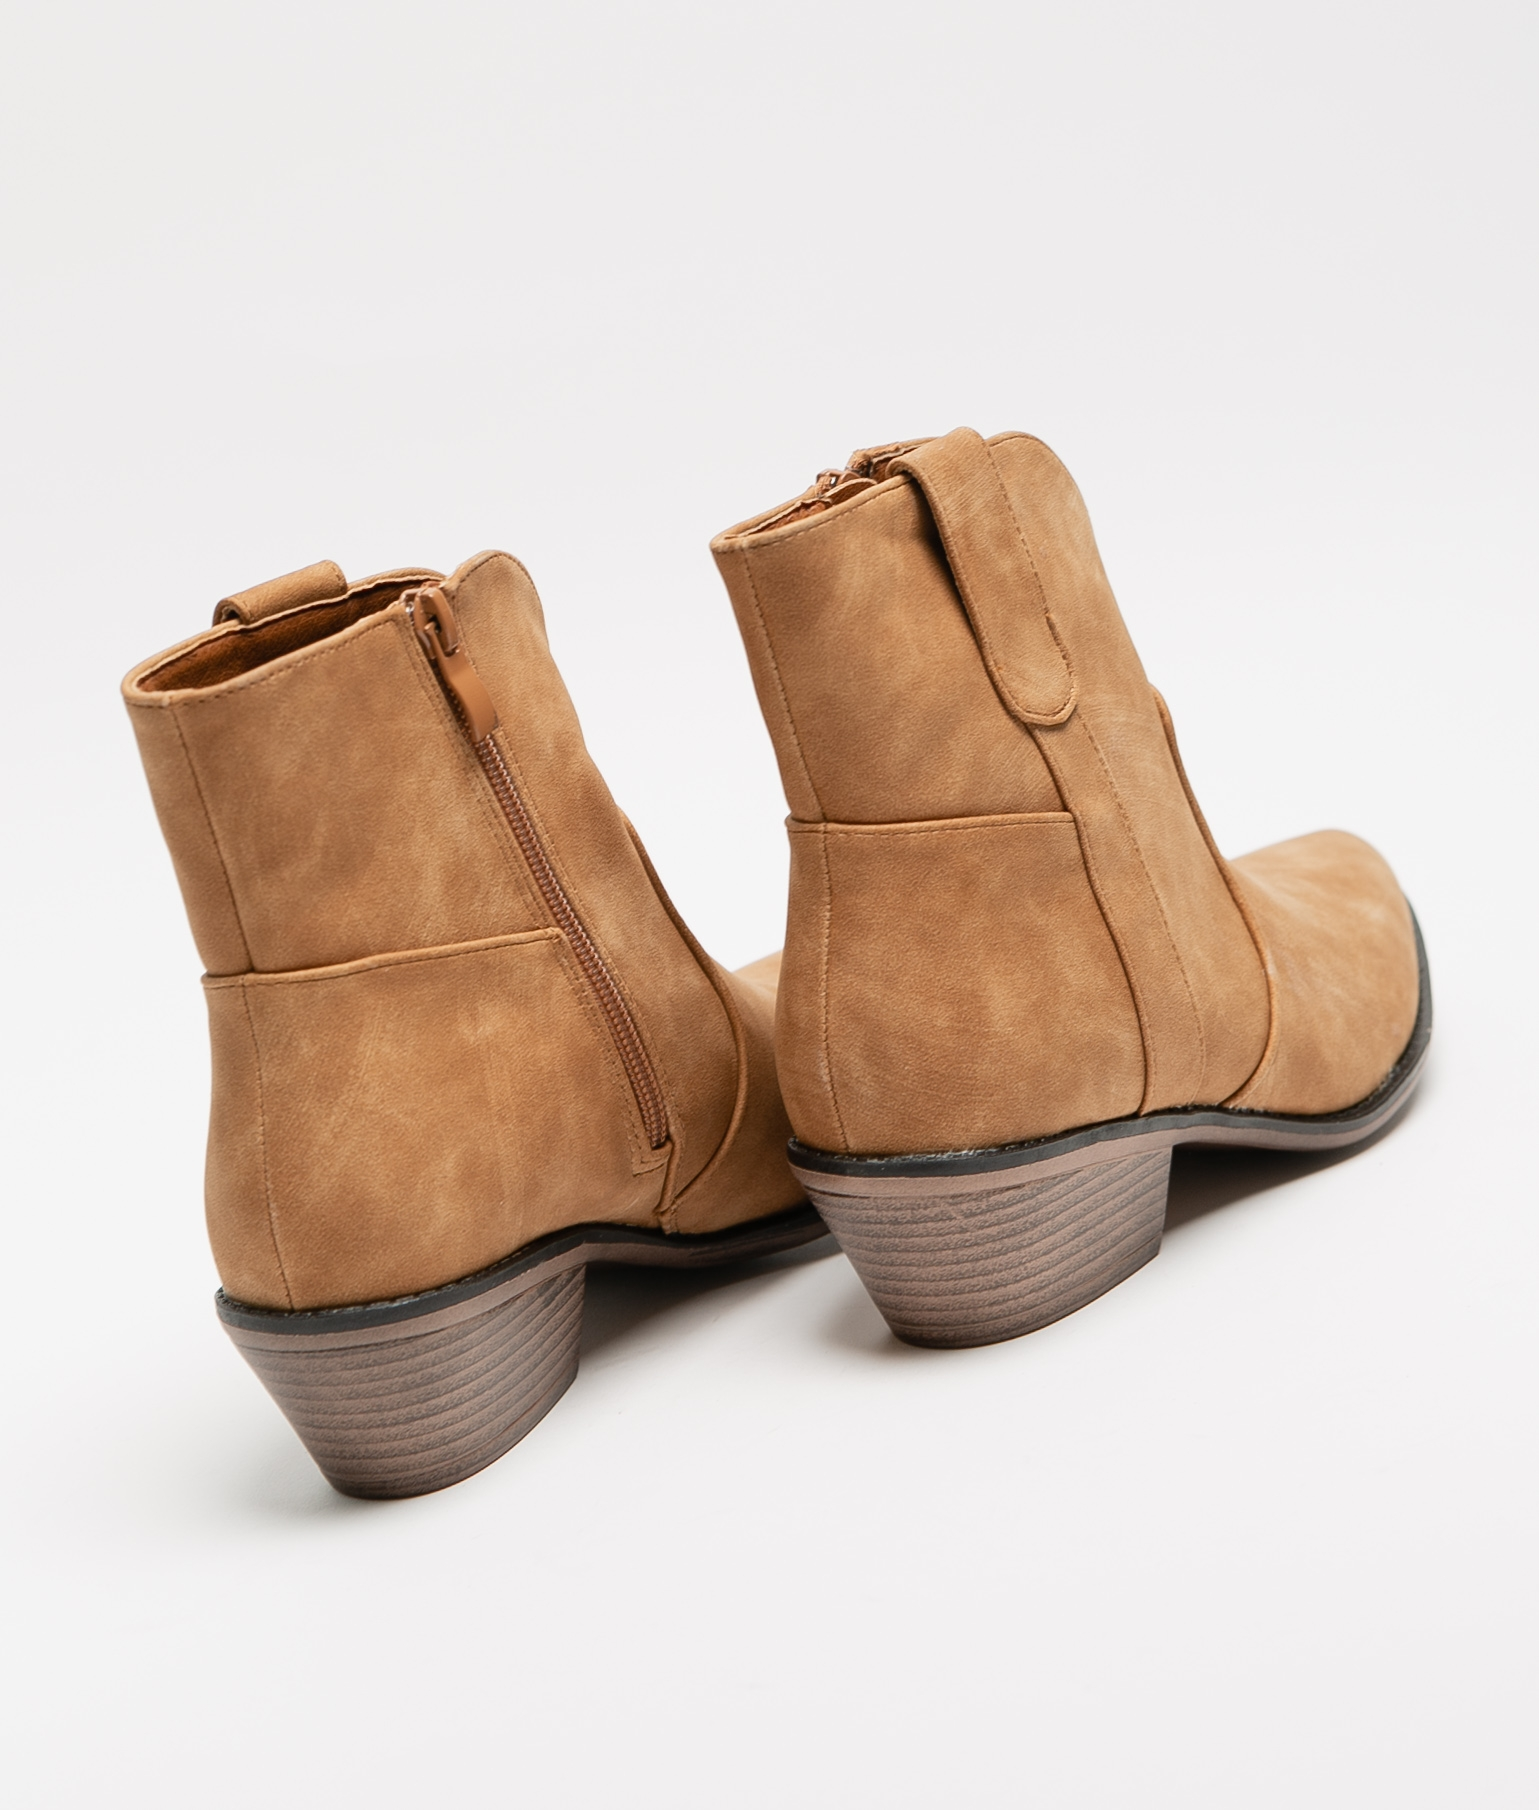 Bota Baja Noli - Camel